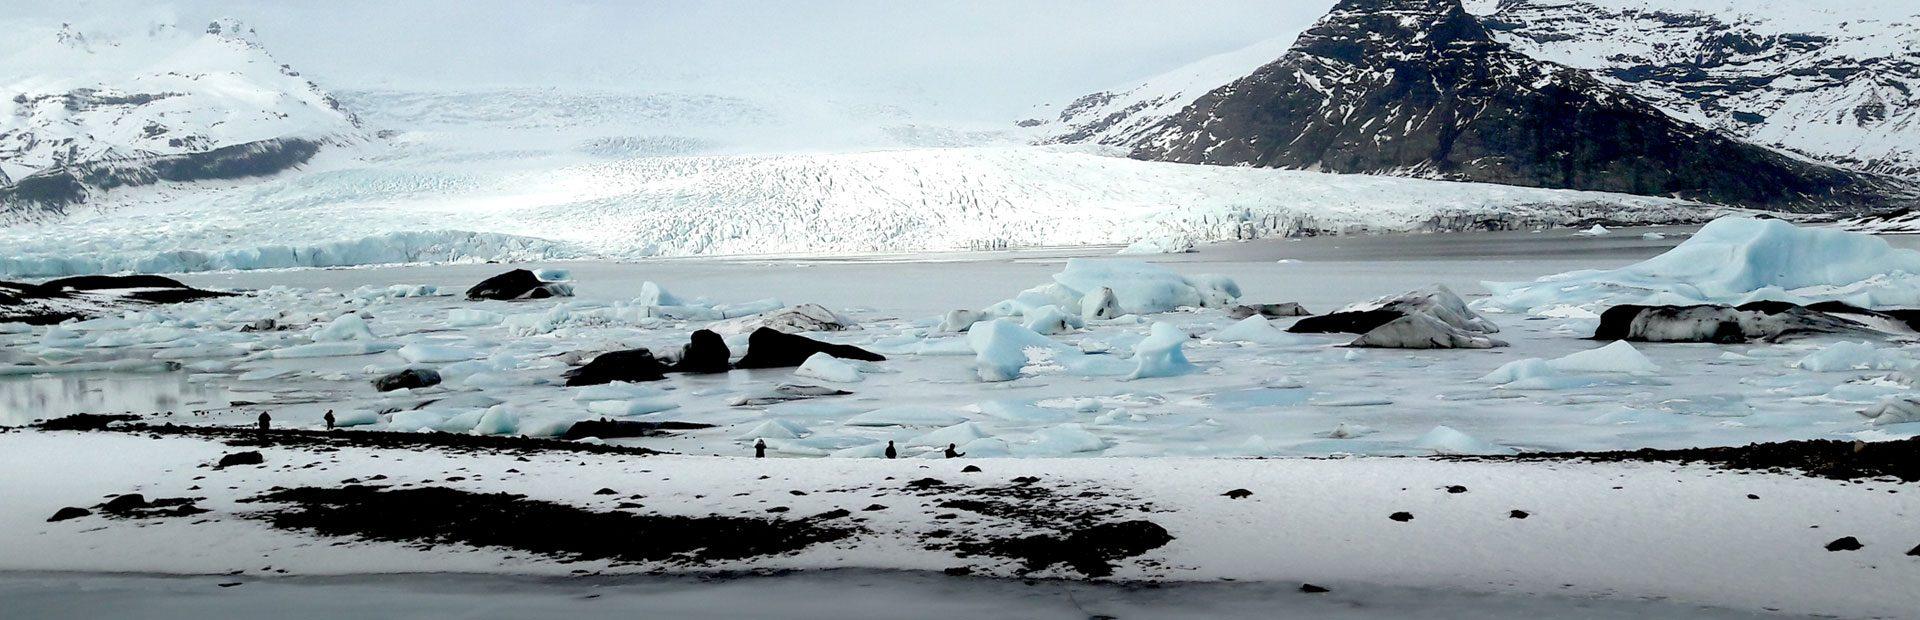 island urlaub im winter